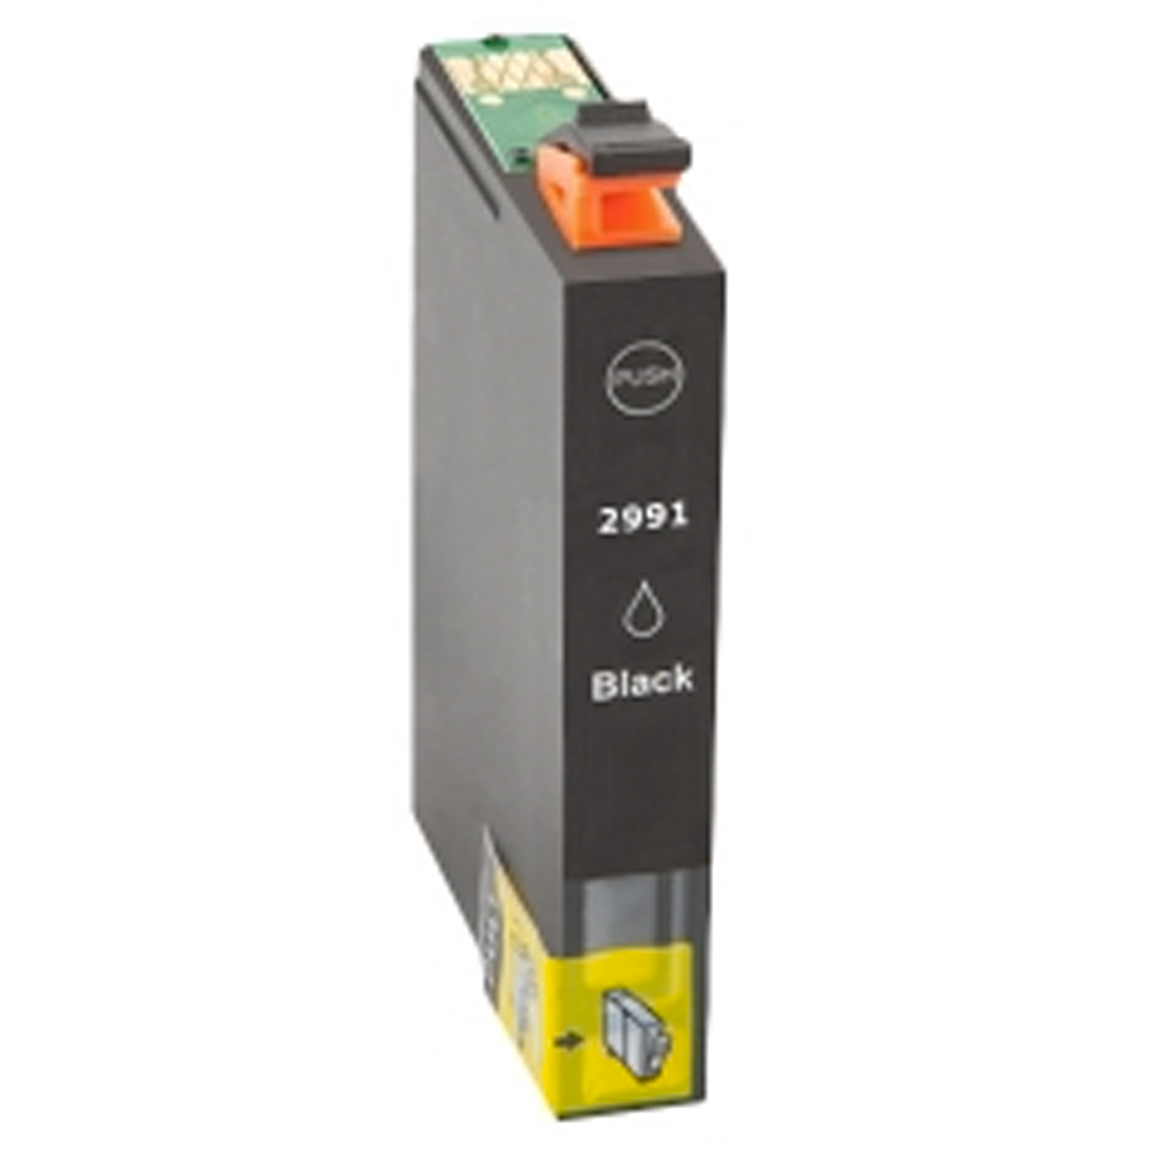 Afbeelding van Epson Expression Home XP 257 inkt cartridge Black 29 Xl T2991 (huismerk inktcartridges)